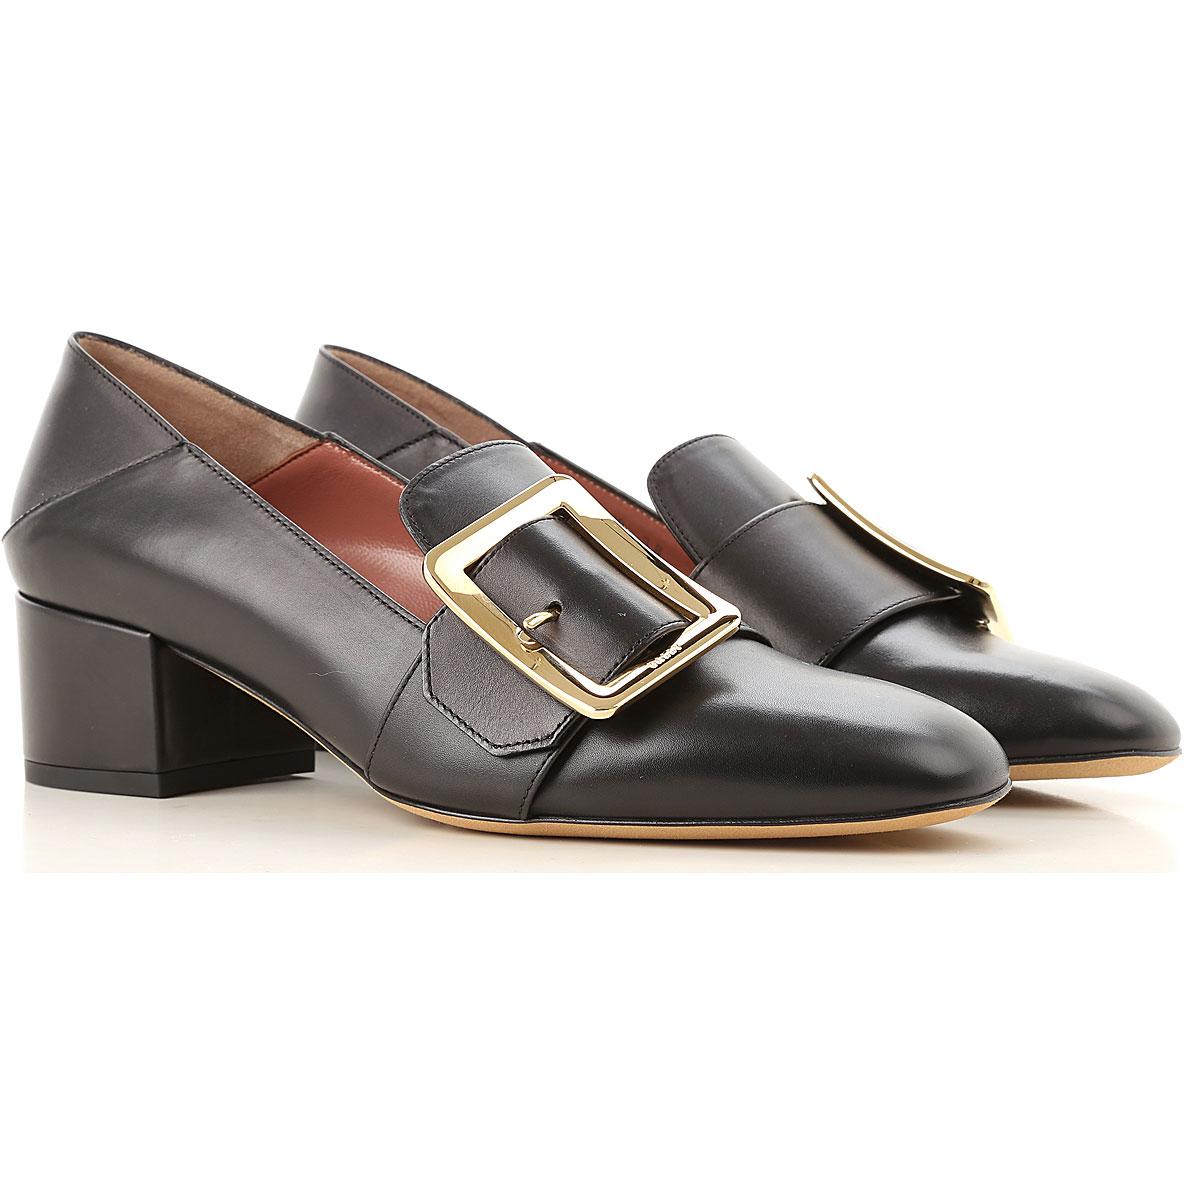 Image of Bally Pumps & High Heels for Women, Black, Leather, 2017, EUR 36 - UK 3 - USA 5.5 EUR 37 - UK 4 - USA 6.5 EUR 38 - UK 5 - USA 7.5 EUR 39 - UK 6 - USA 8.5 EUR 40 - UK 7 - USA 9.5